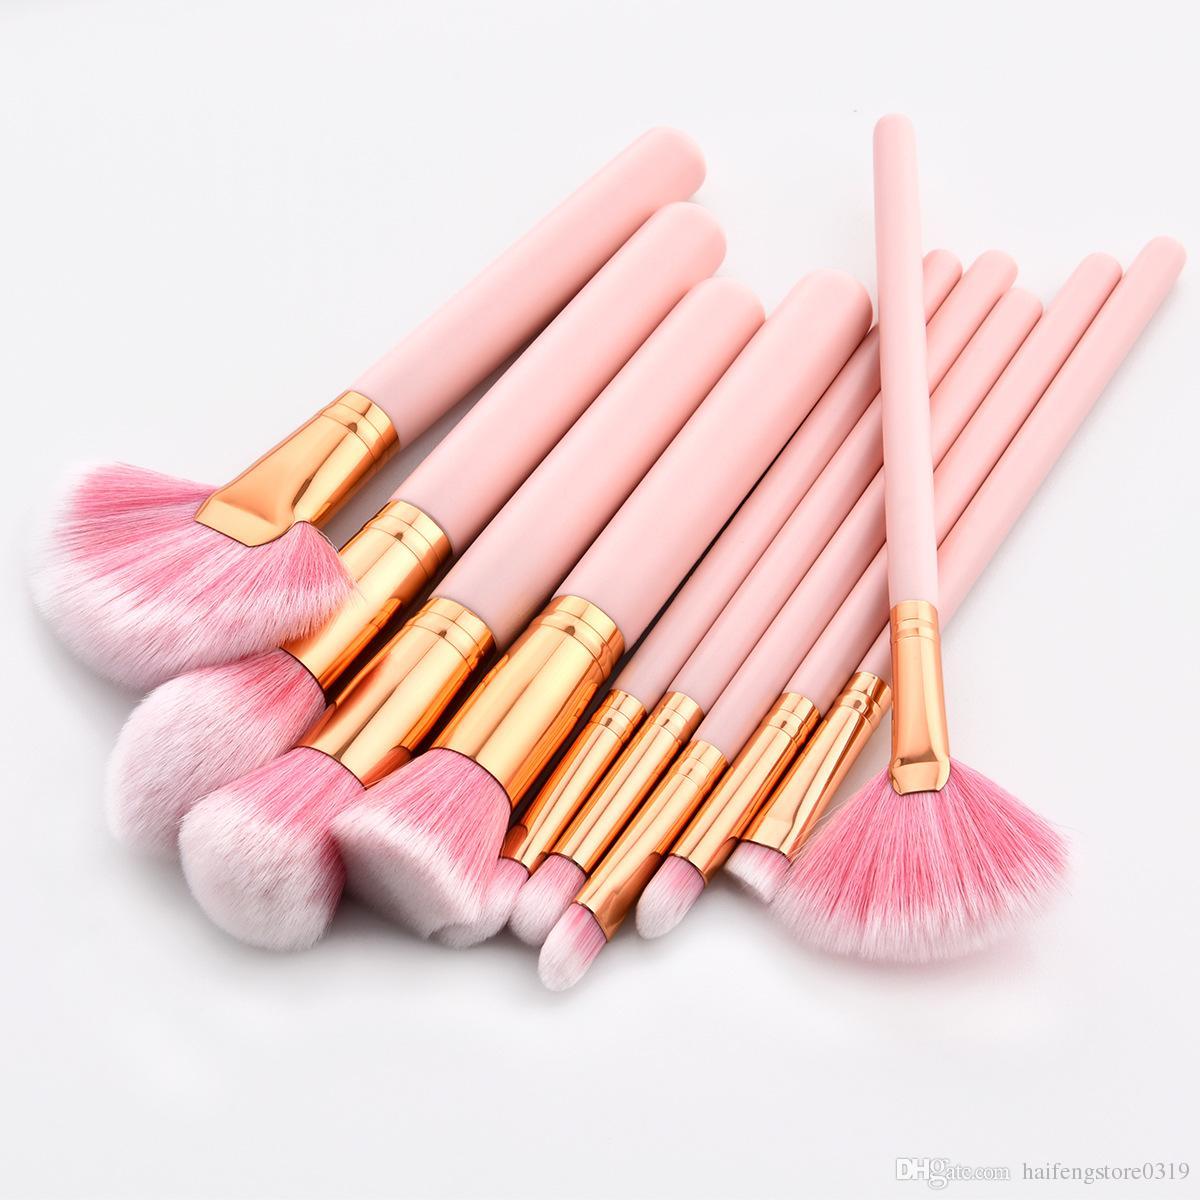 10pcs Pink Professional Makeup Brushes Set Foundation Powder Blusher Eyeshadow Beauty Makeup Brush Tools Kit